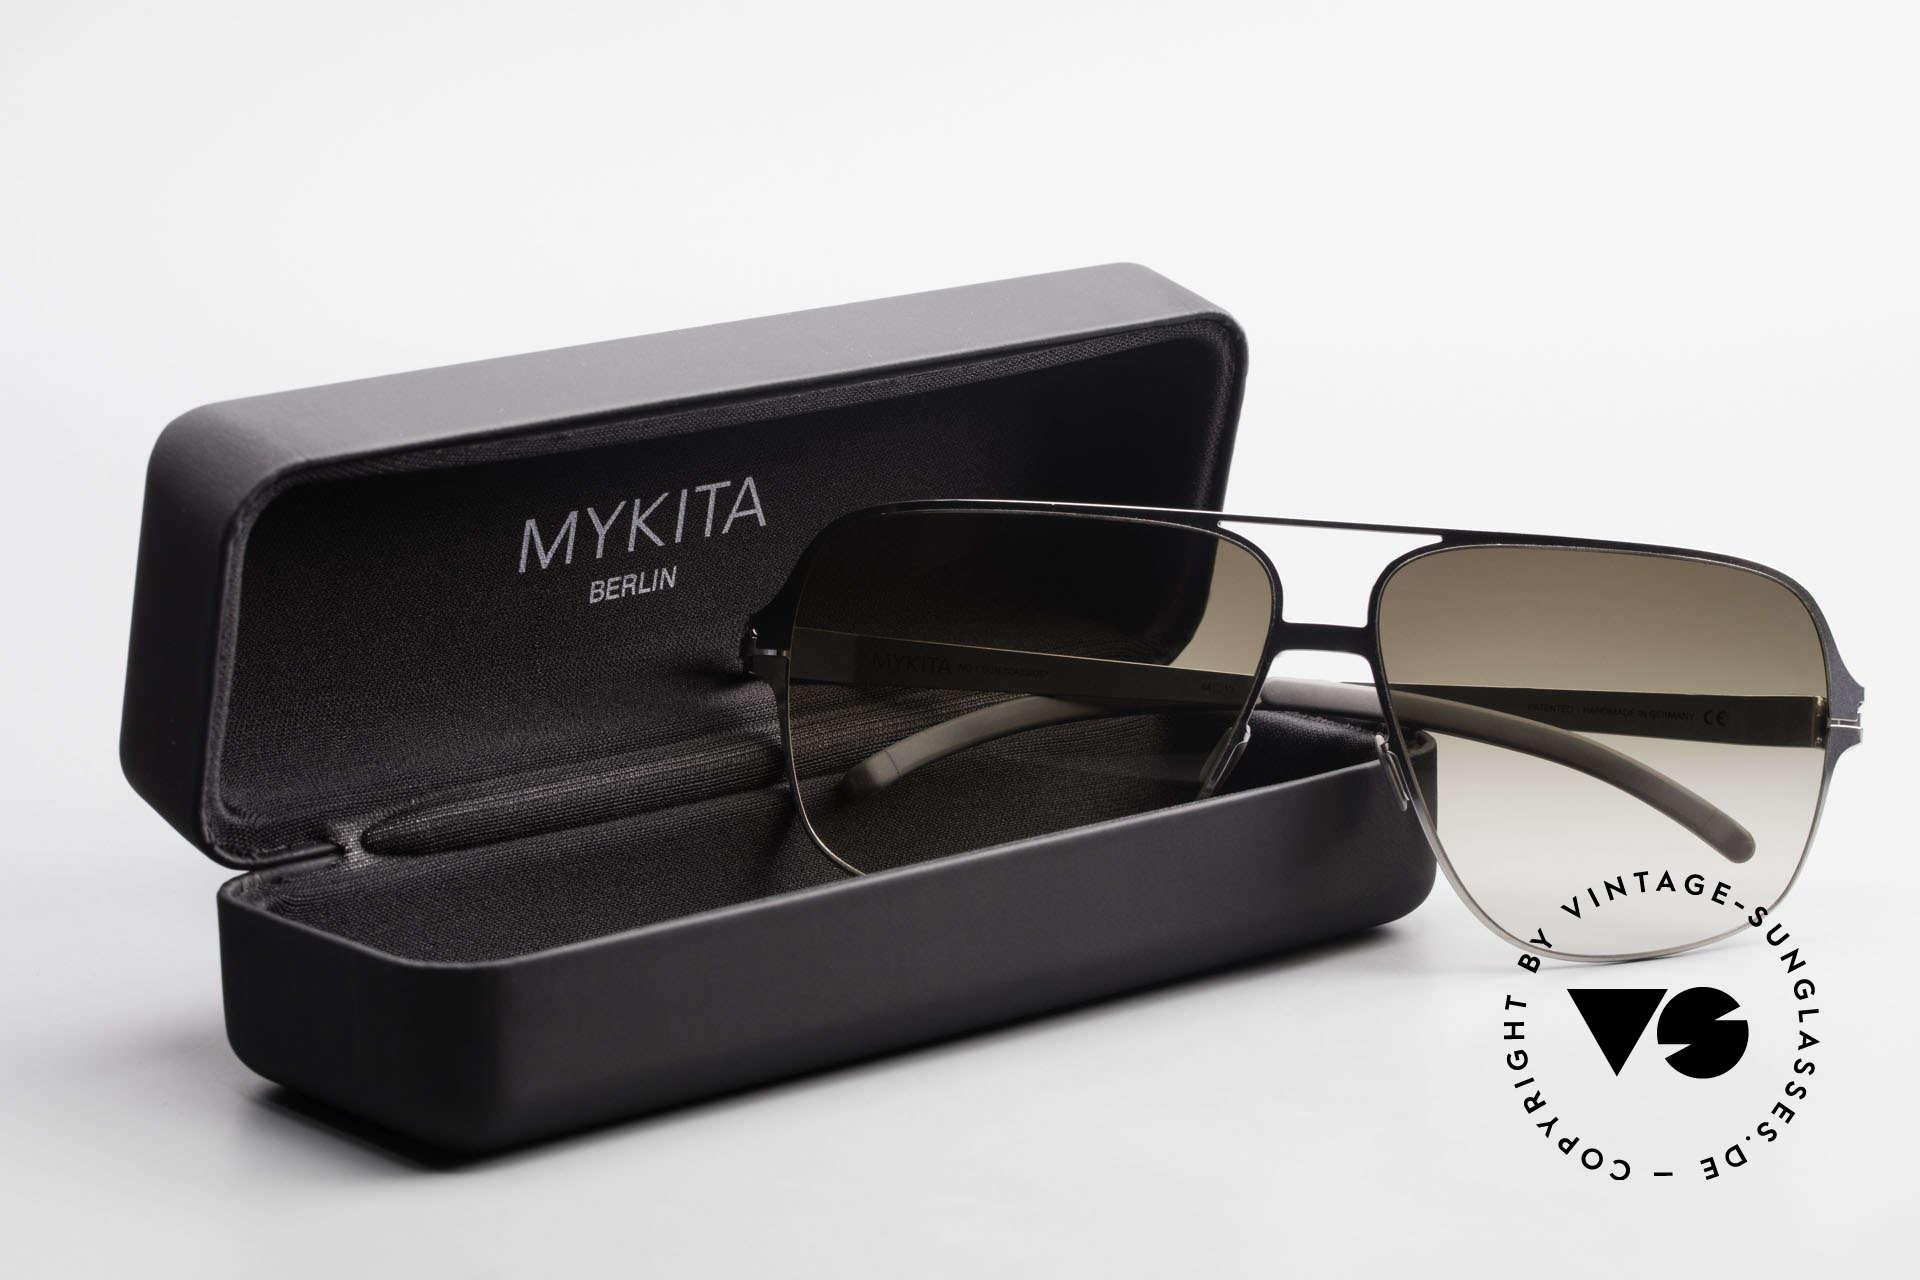 Mykita Cassius Lenny Kravitz Sunglasses XXL, Size: extra large, Made for Men